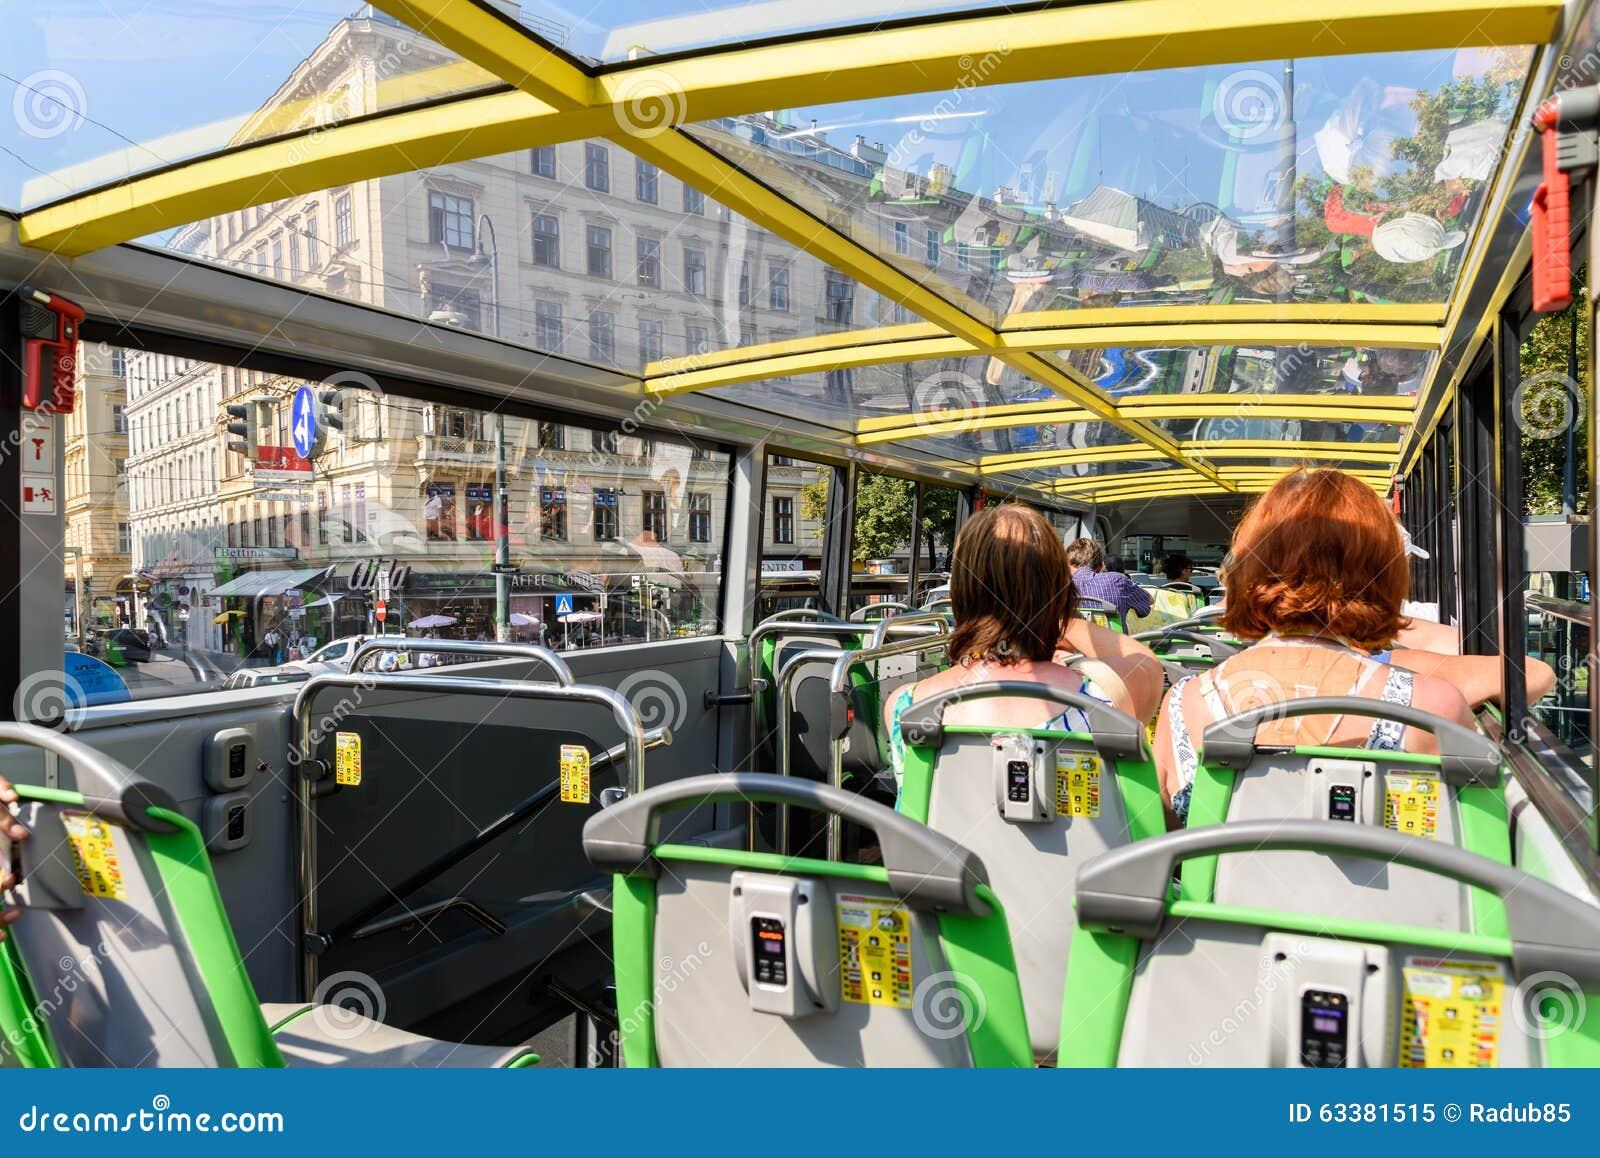 Vienna Hop On Hop Off